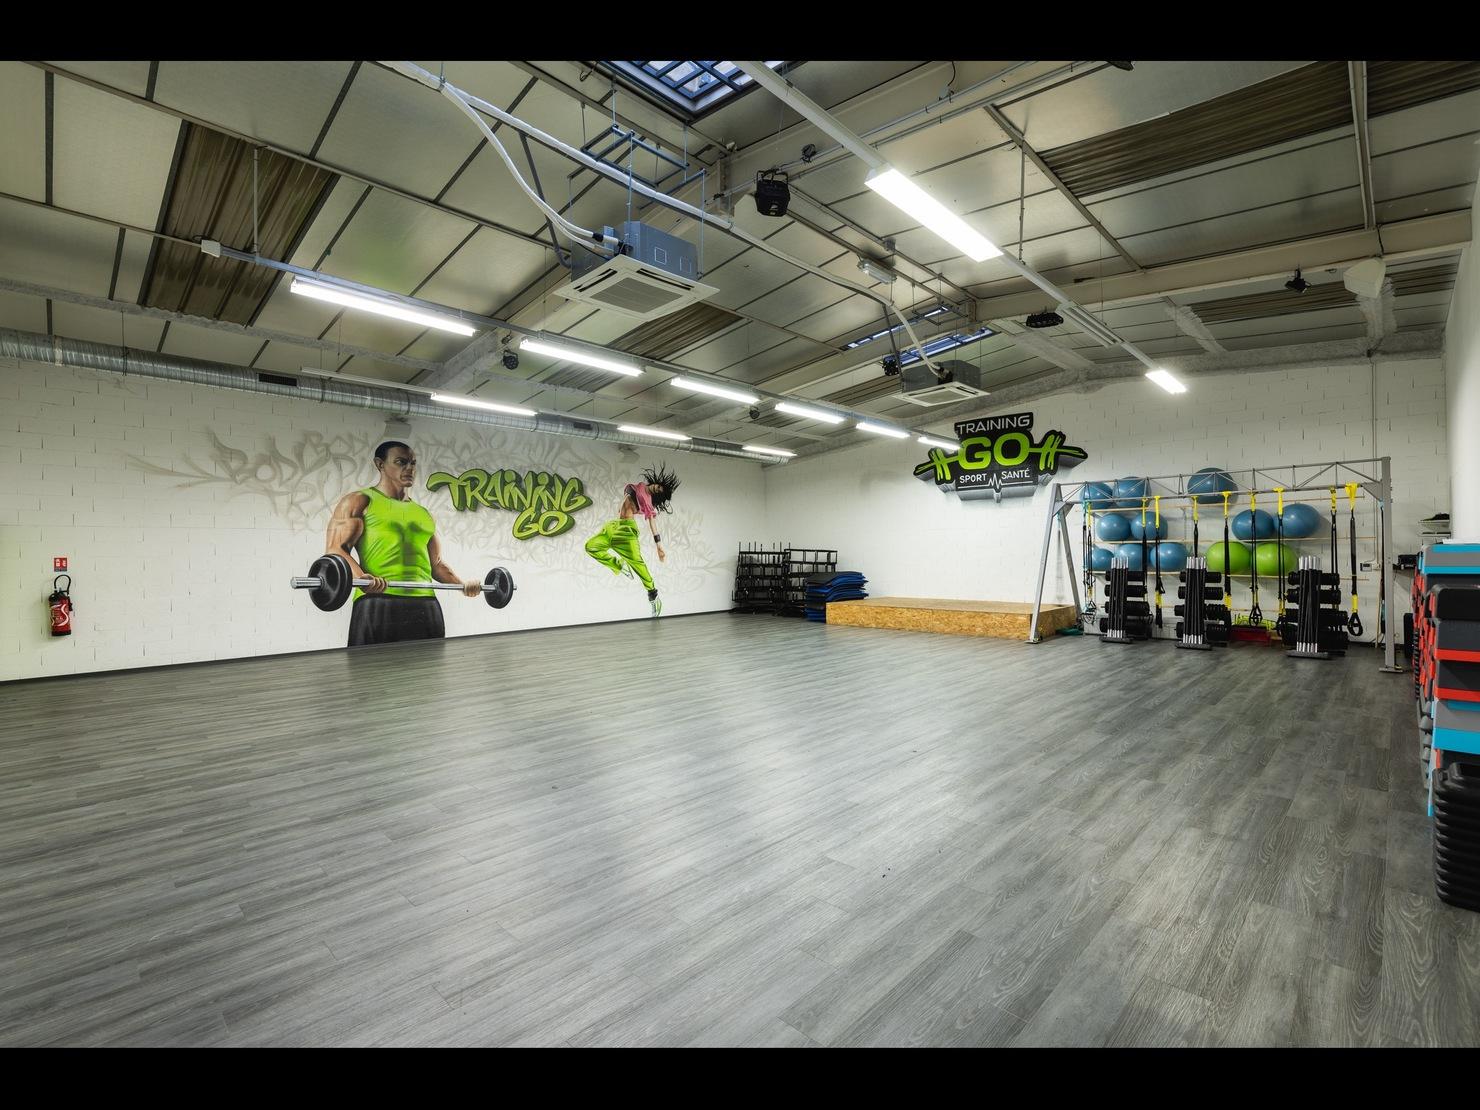 Training GO Montpellier